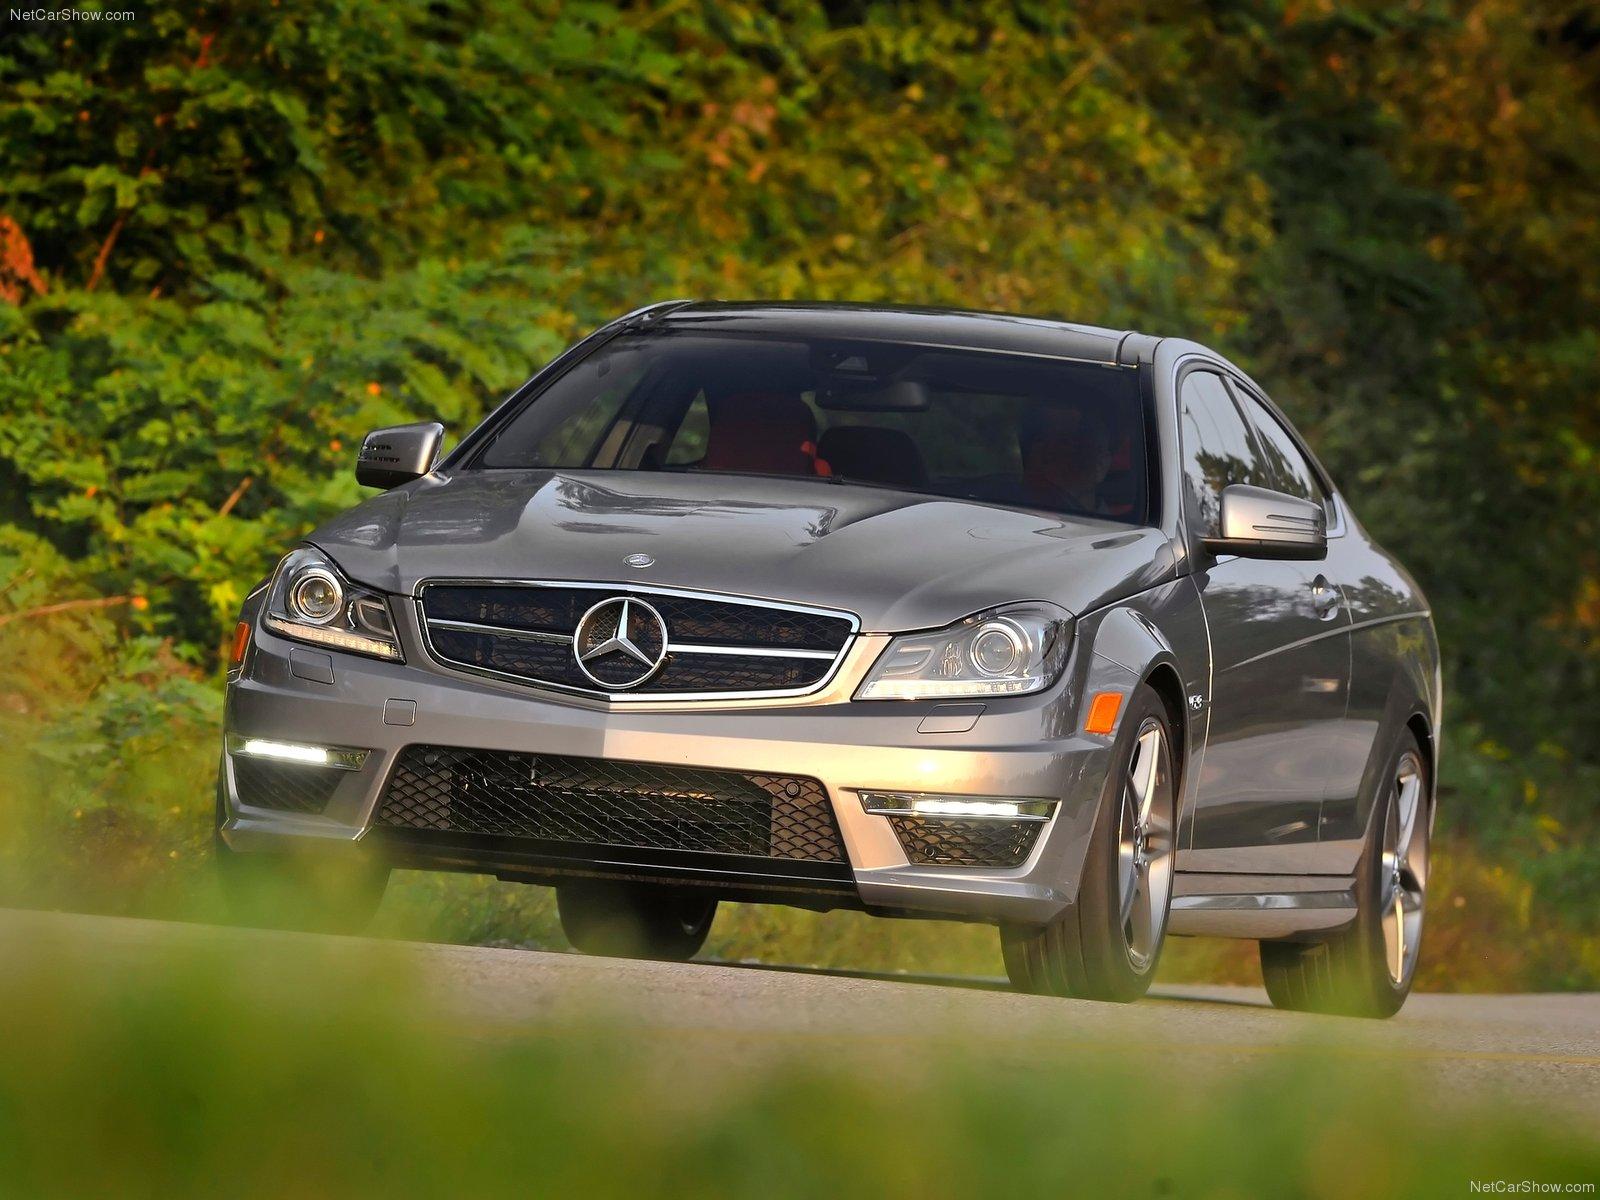 Mercedes-Benz C63 AMG Coupe photo 84568